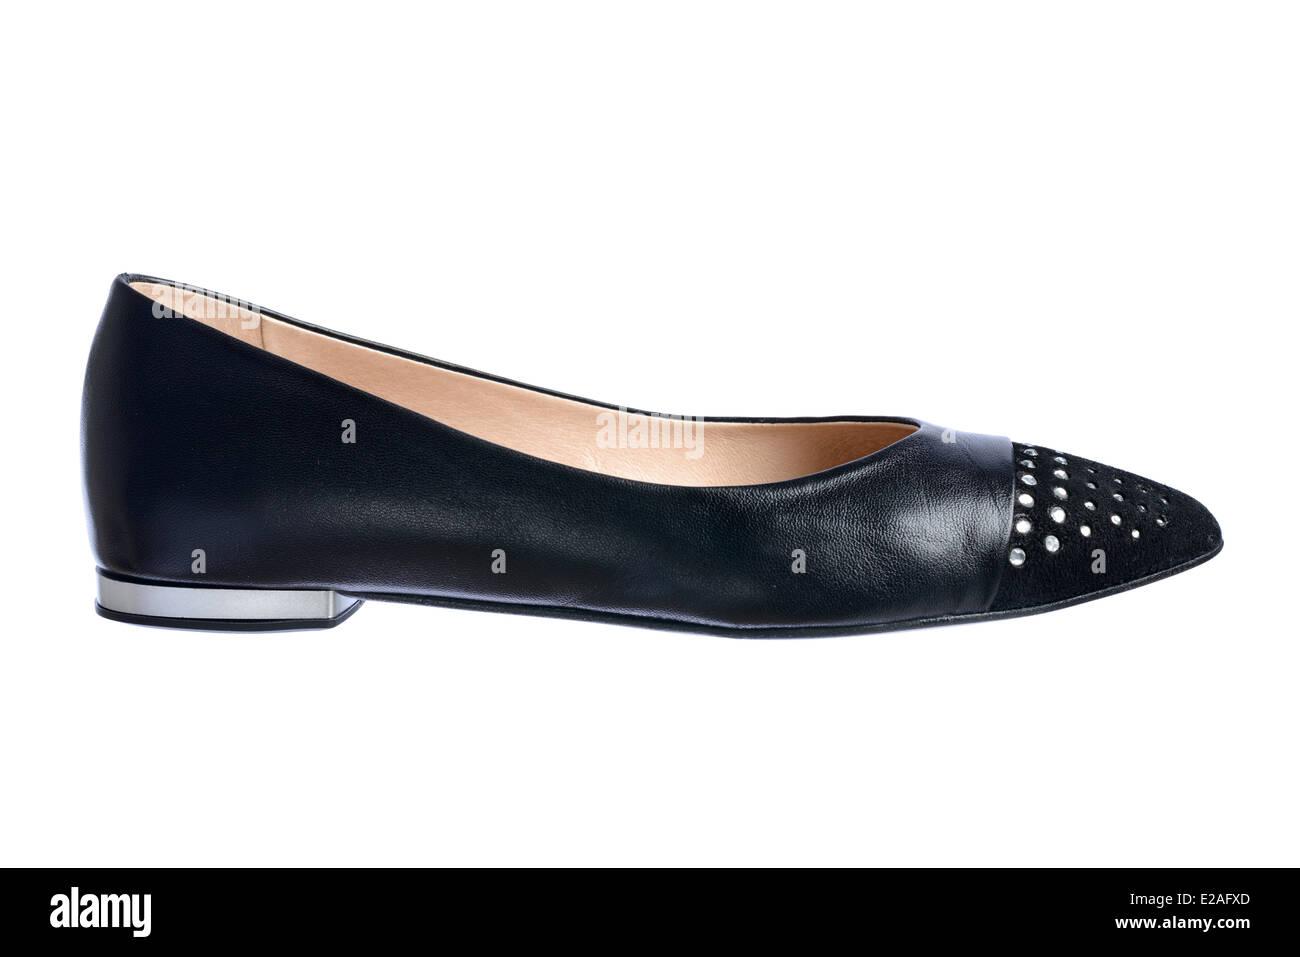 c5f02c91b Flat Black Shoes Women Stock Photos & Flat Black Shoes Women Stock ...